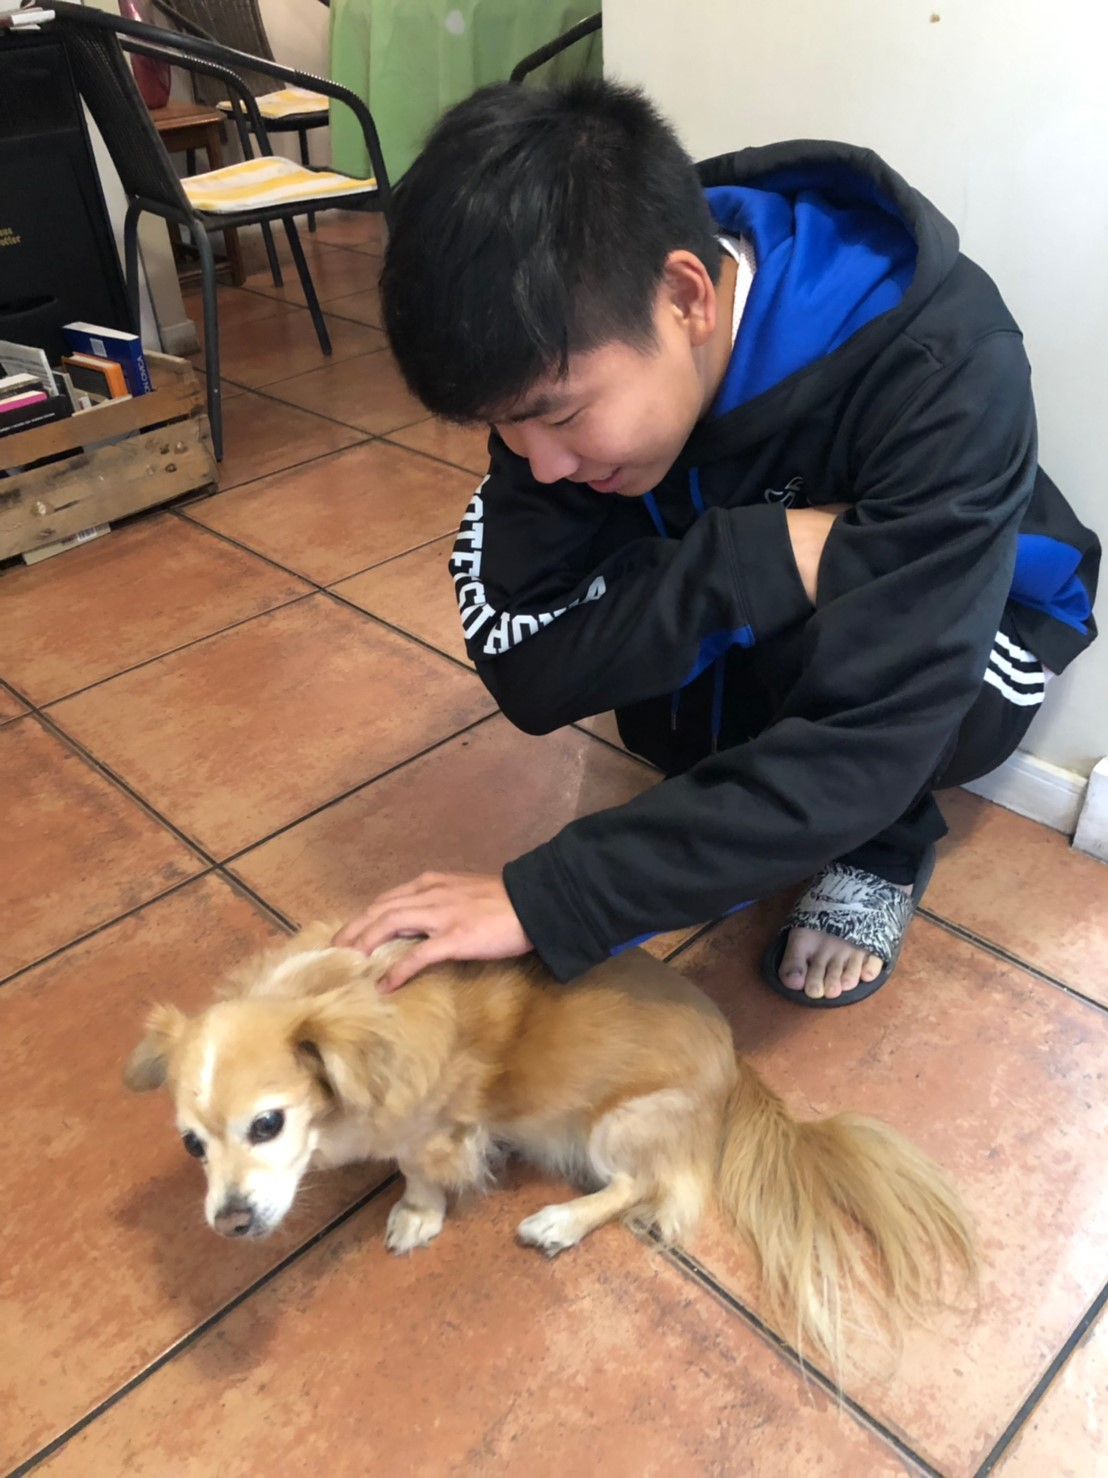 Yasuhiro Ishiyama with Poofy/Puffy/Fluffy, the Grange Family's Friendly Dog